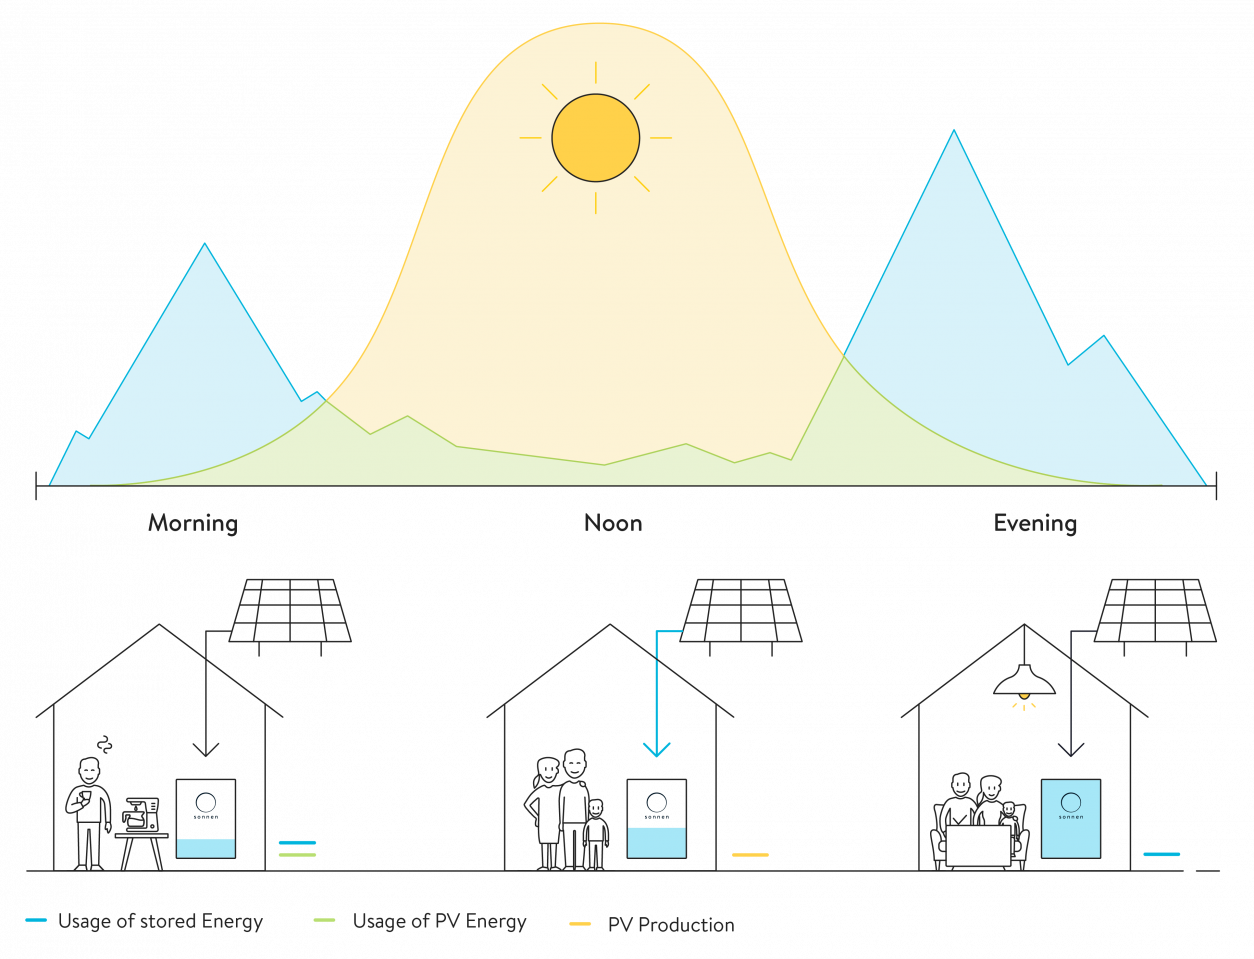 Day Illustration